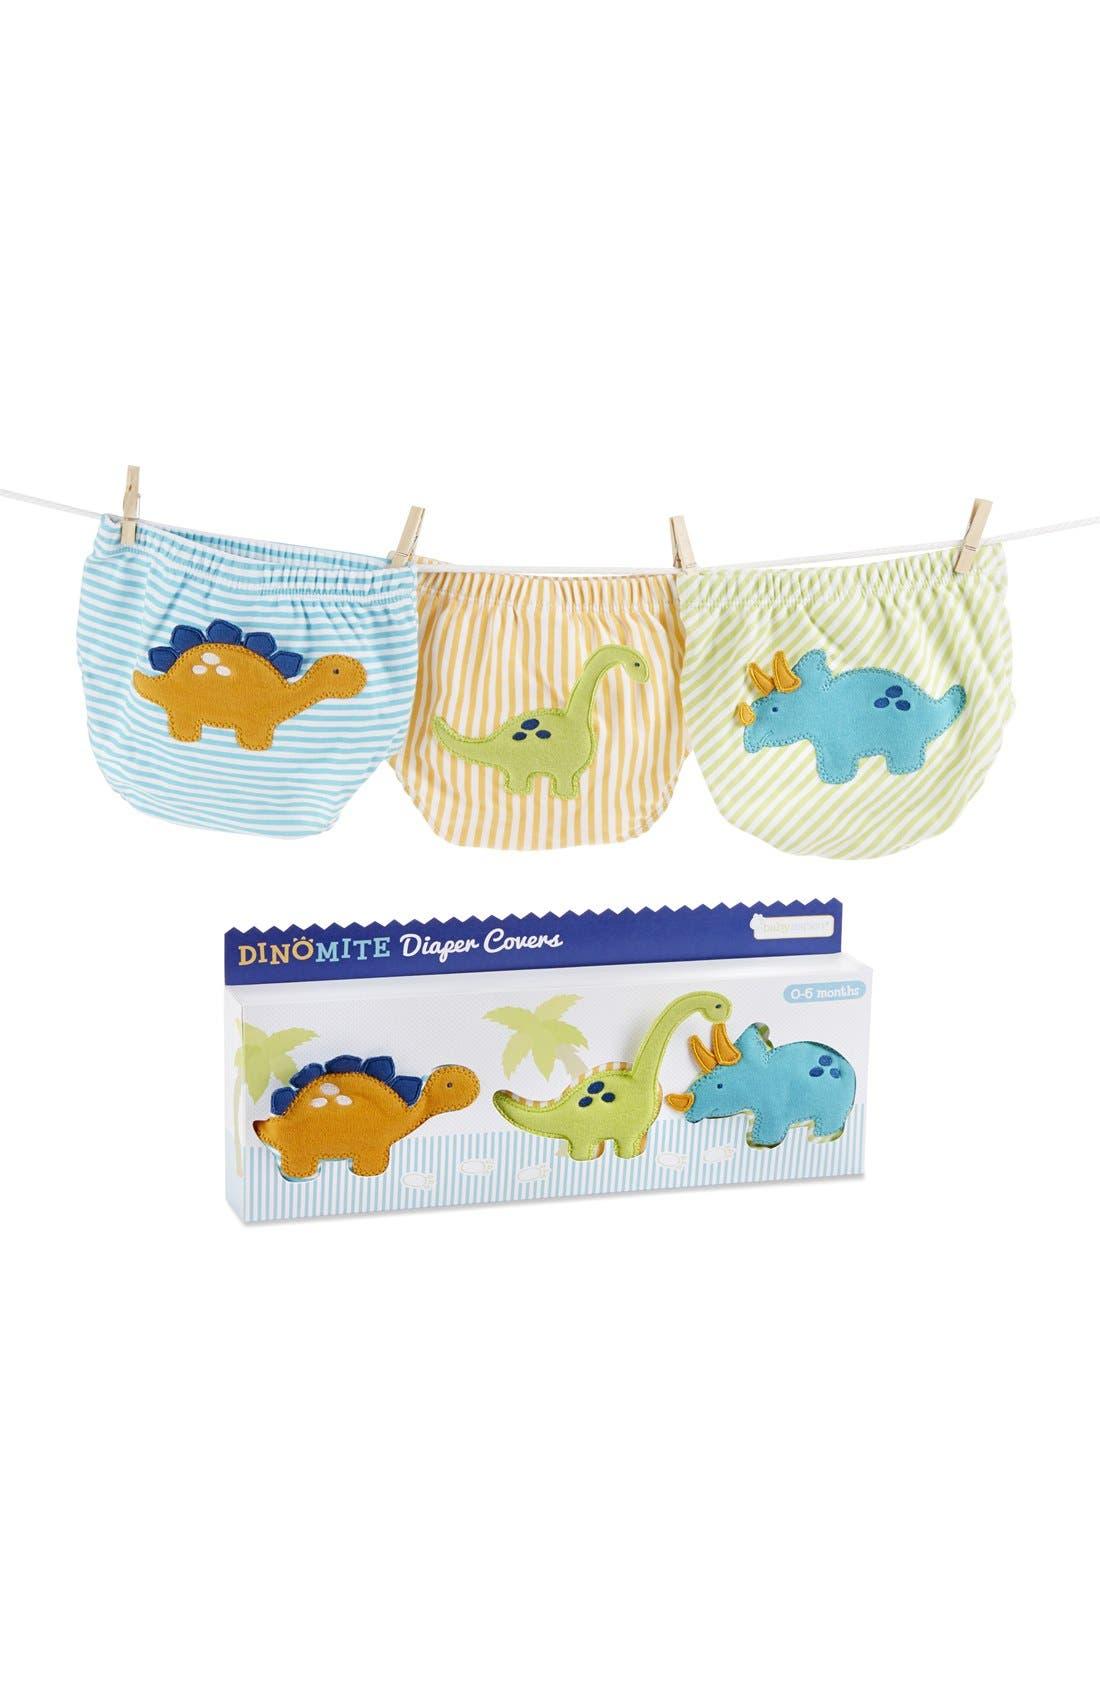 Main Image - Baby Aspen 'Dinomite' Diaper Covers (3-Pack) (Baby)